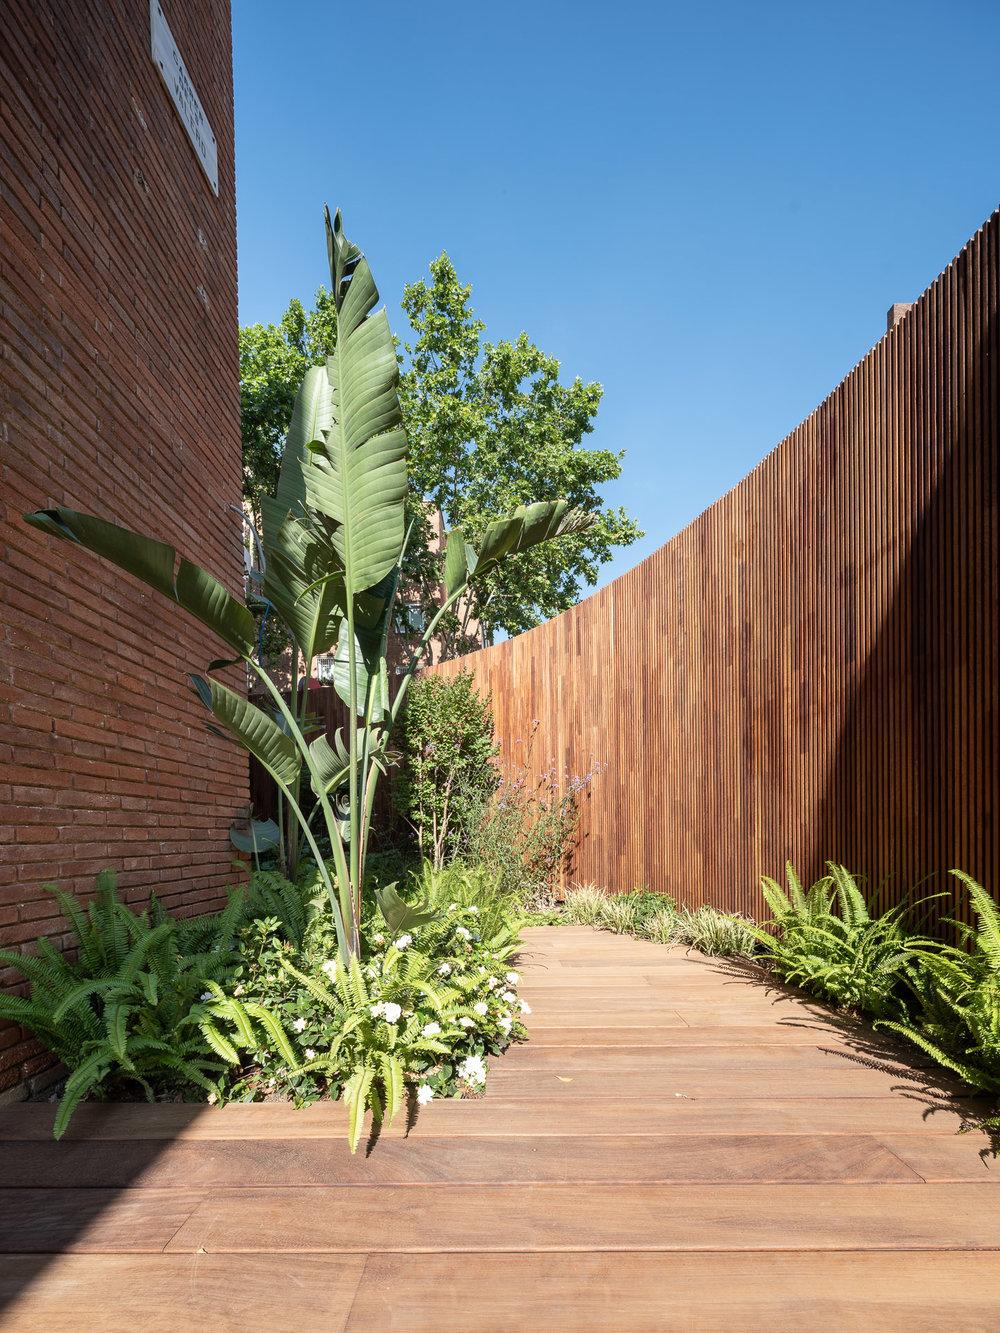 aeland-garden-barcelona1.jpg